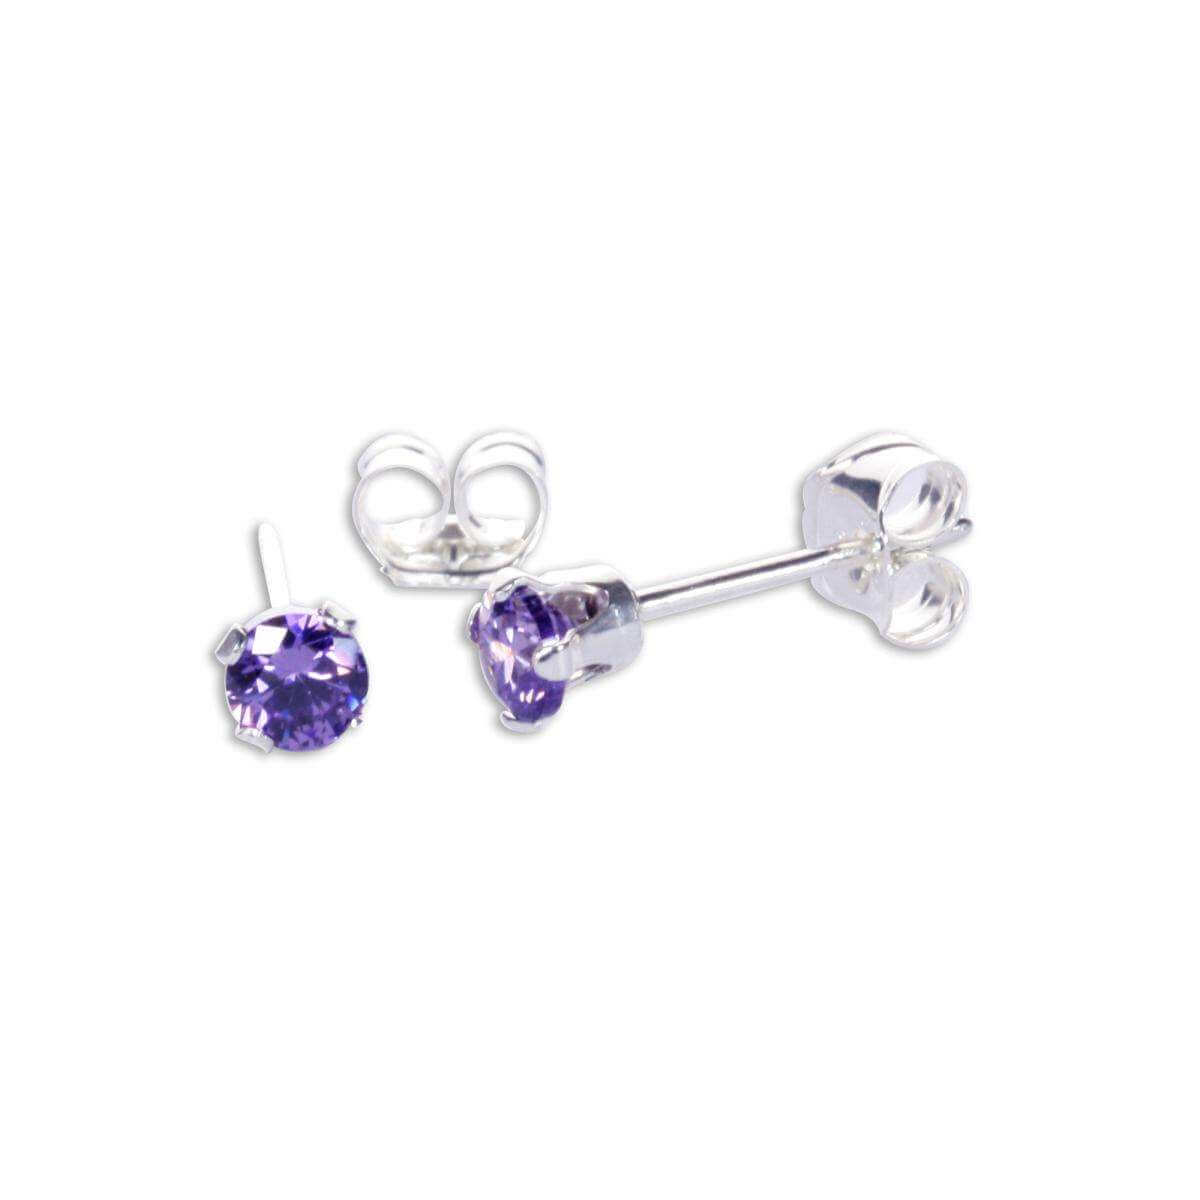 Sterling Silver Amethyst Cz 3mm Round Stud Earrings